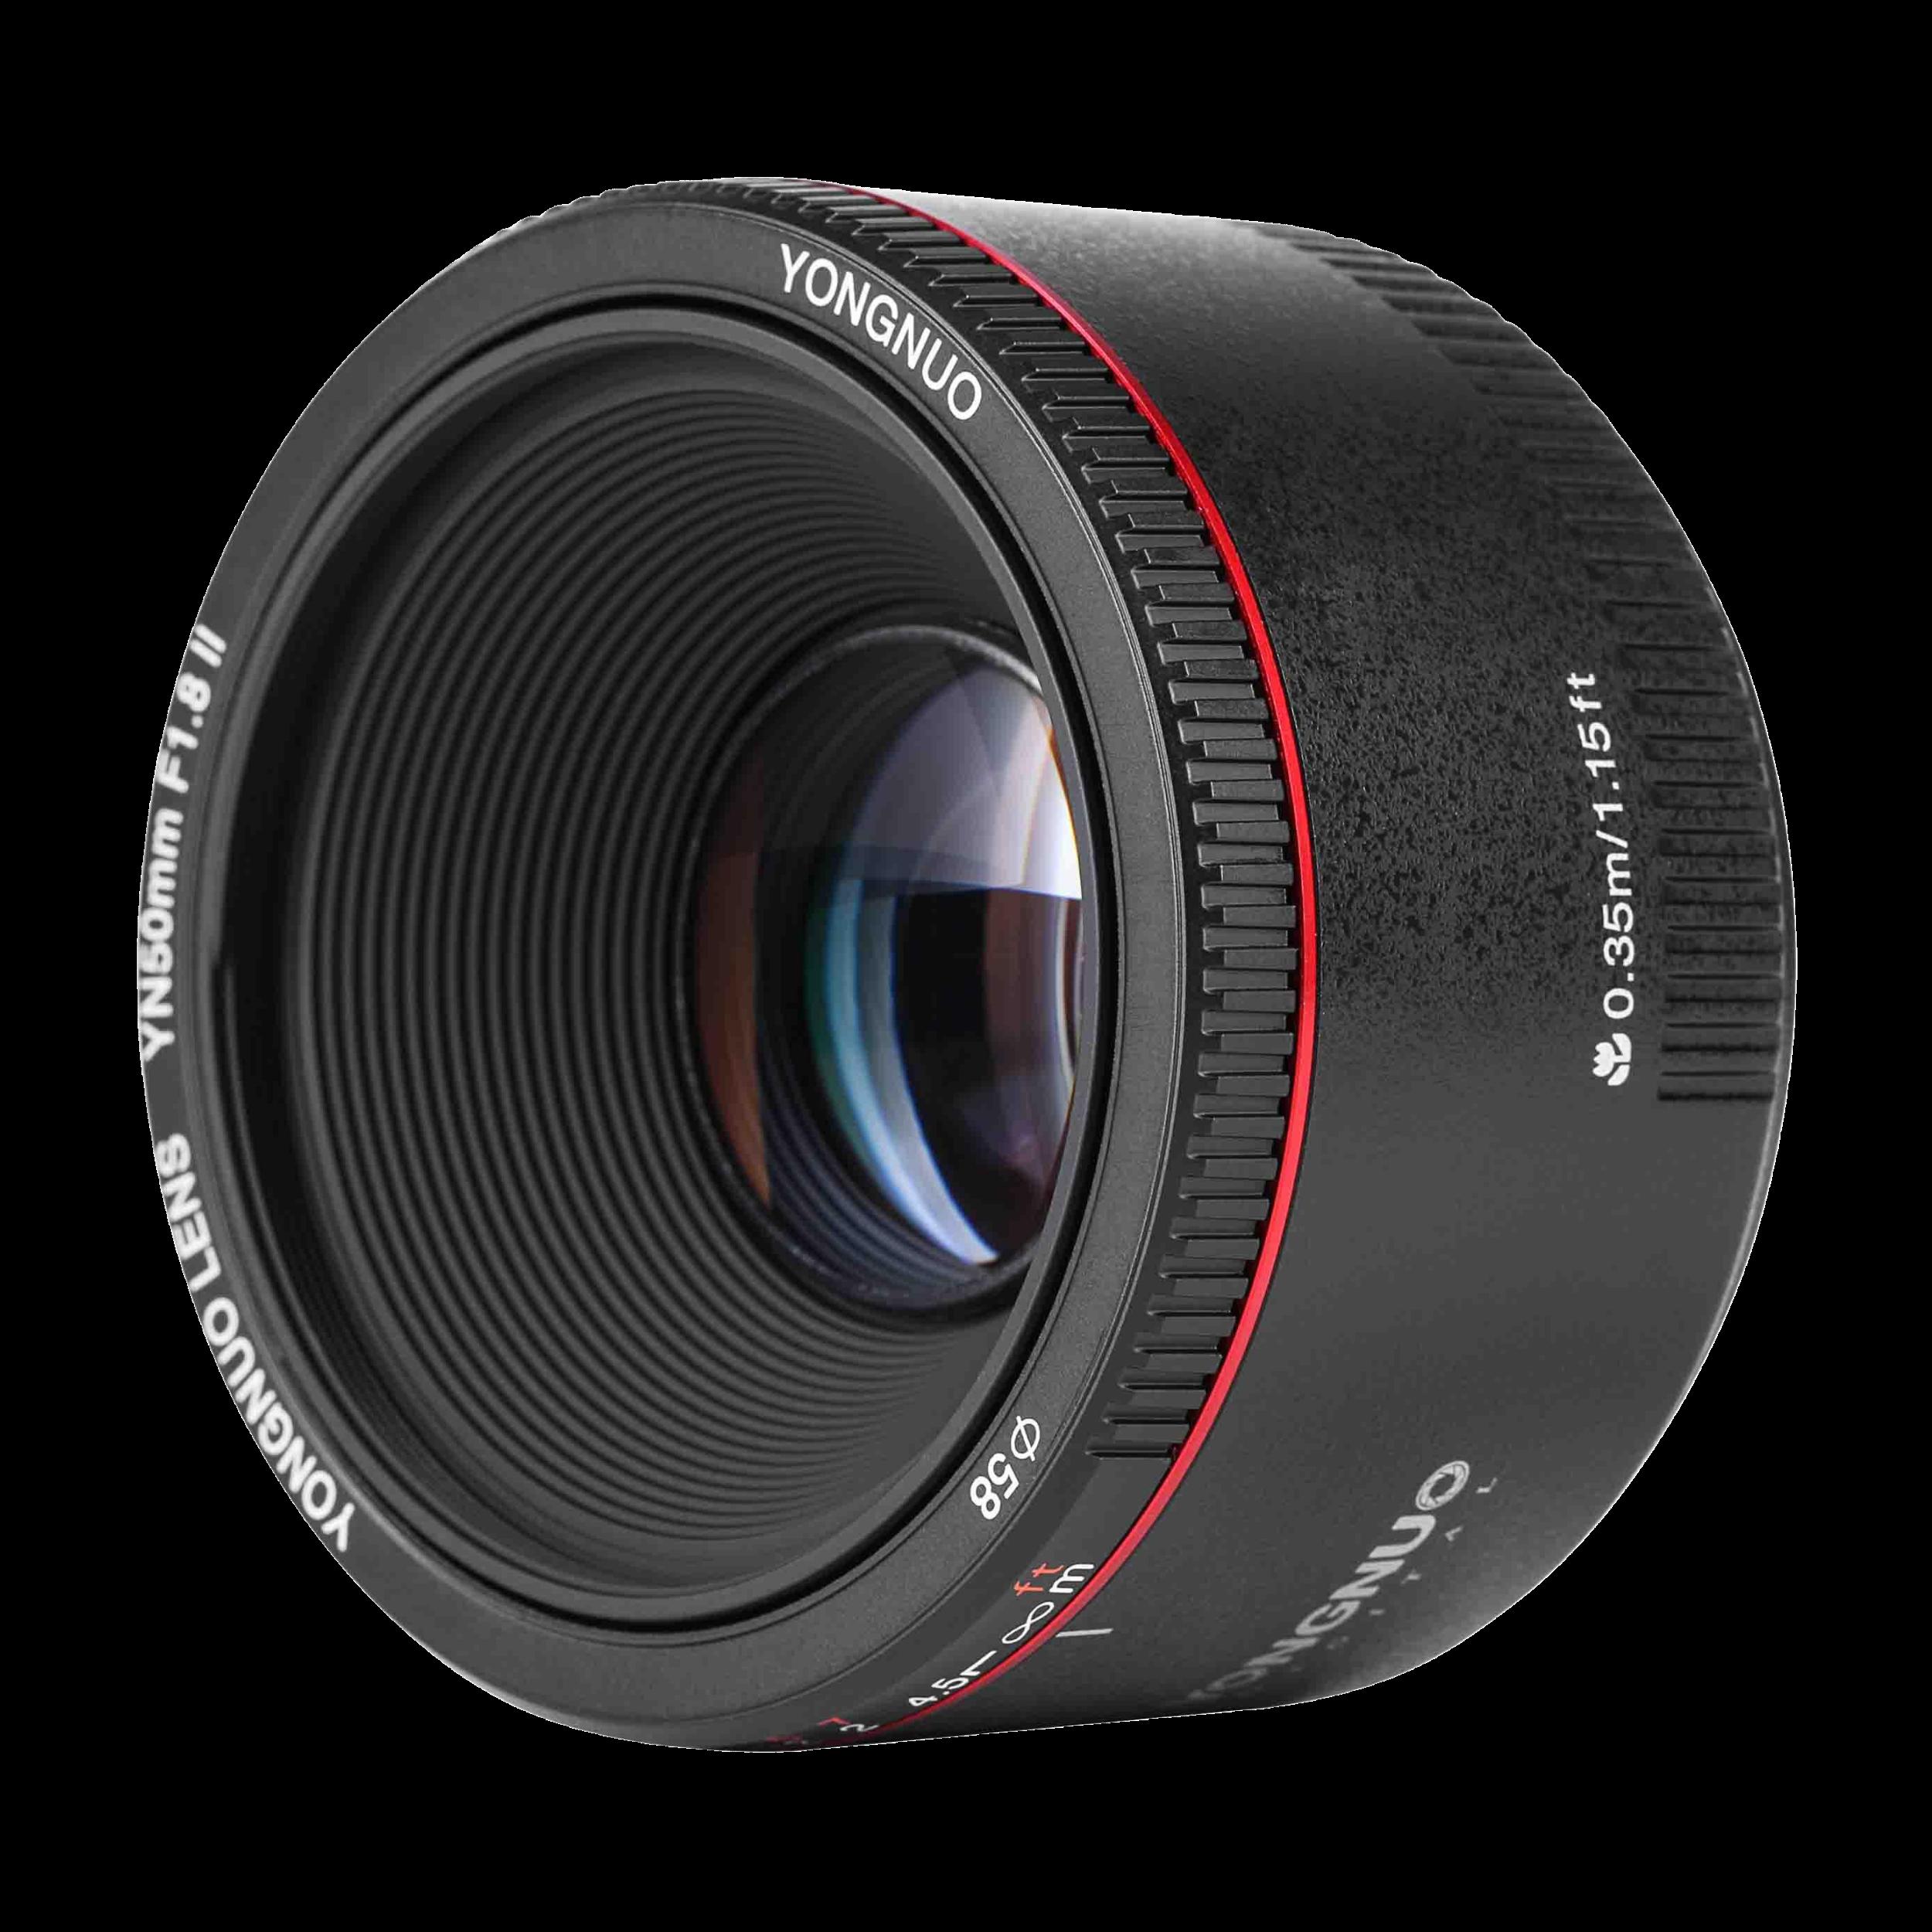 Yongnuo 50mm II f/1.8 - Canon EF